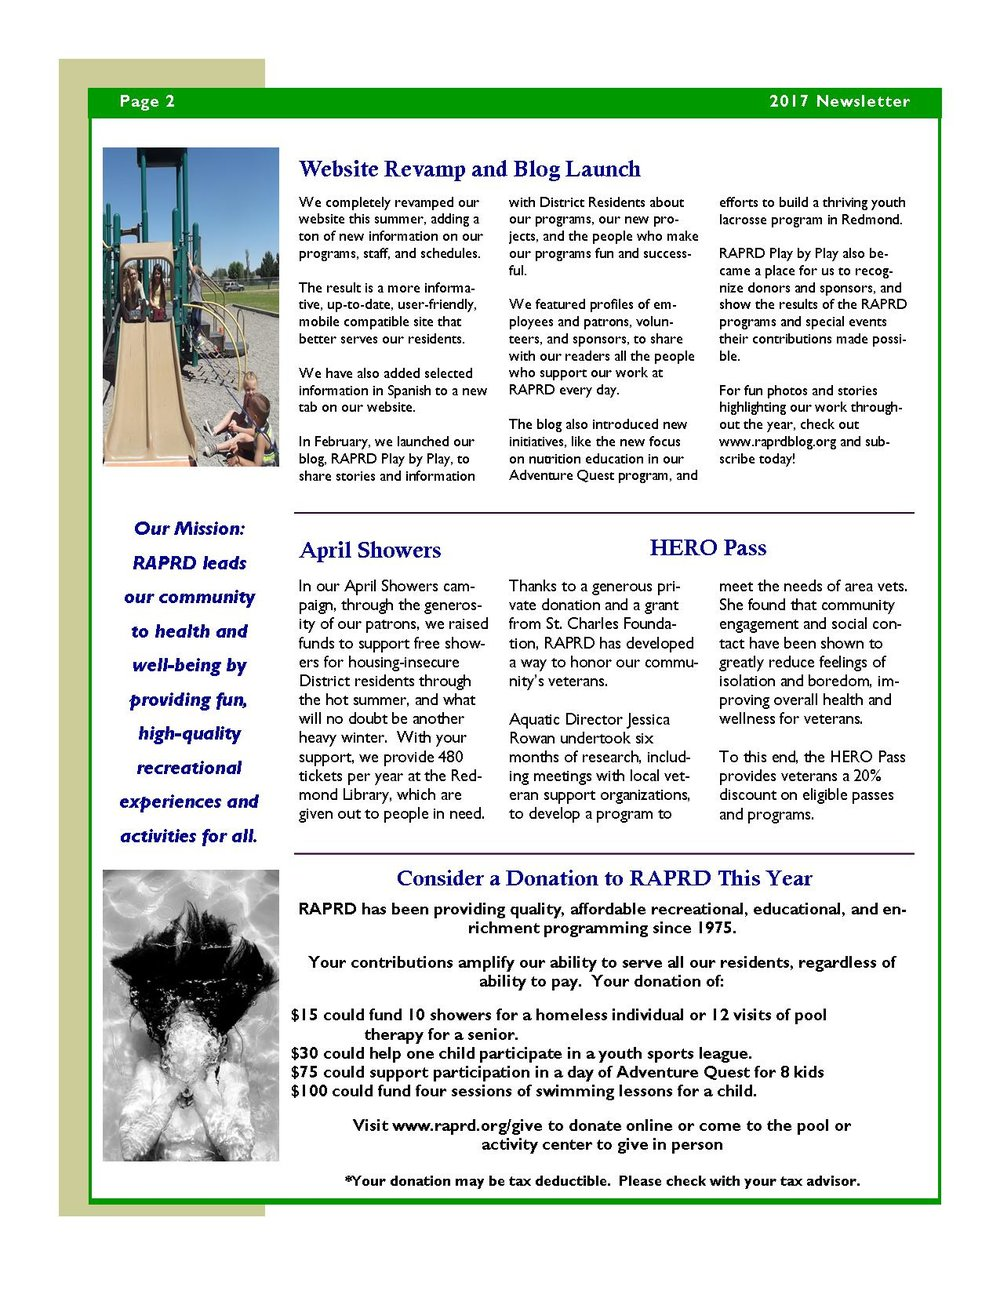 Newsletter 2017 page 2.jpg